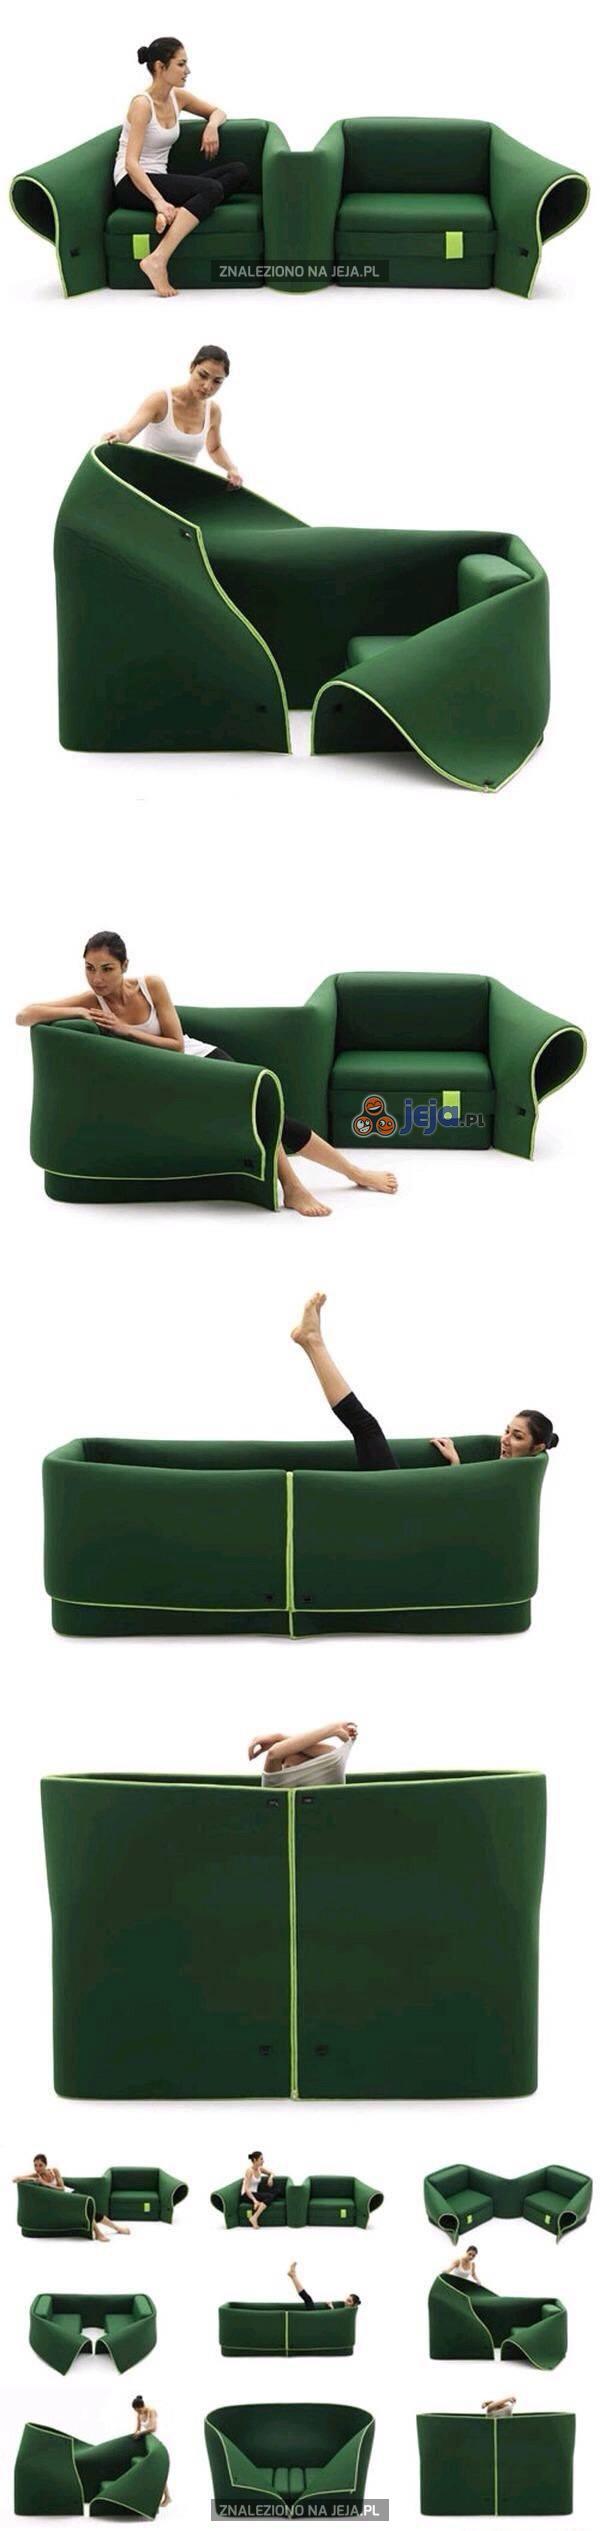 Uniwersalna kanapa